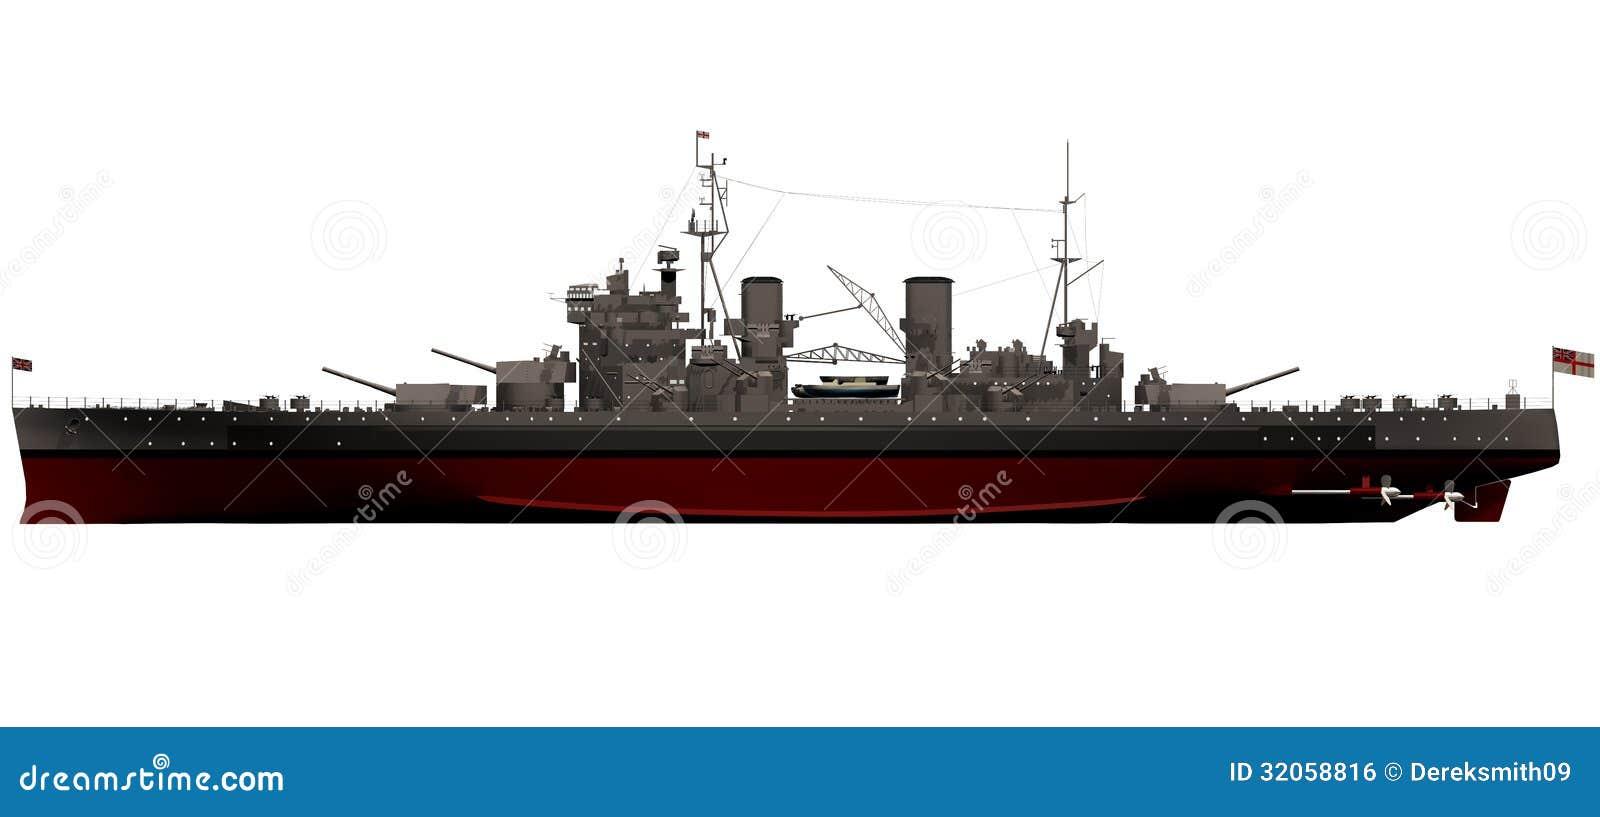 3d Rendering Of The King George V Battleship